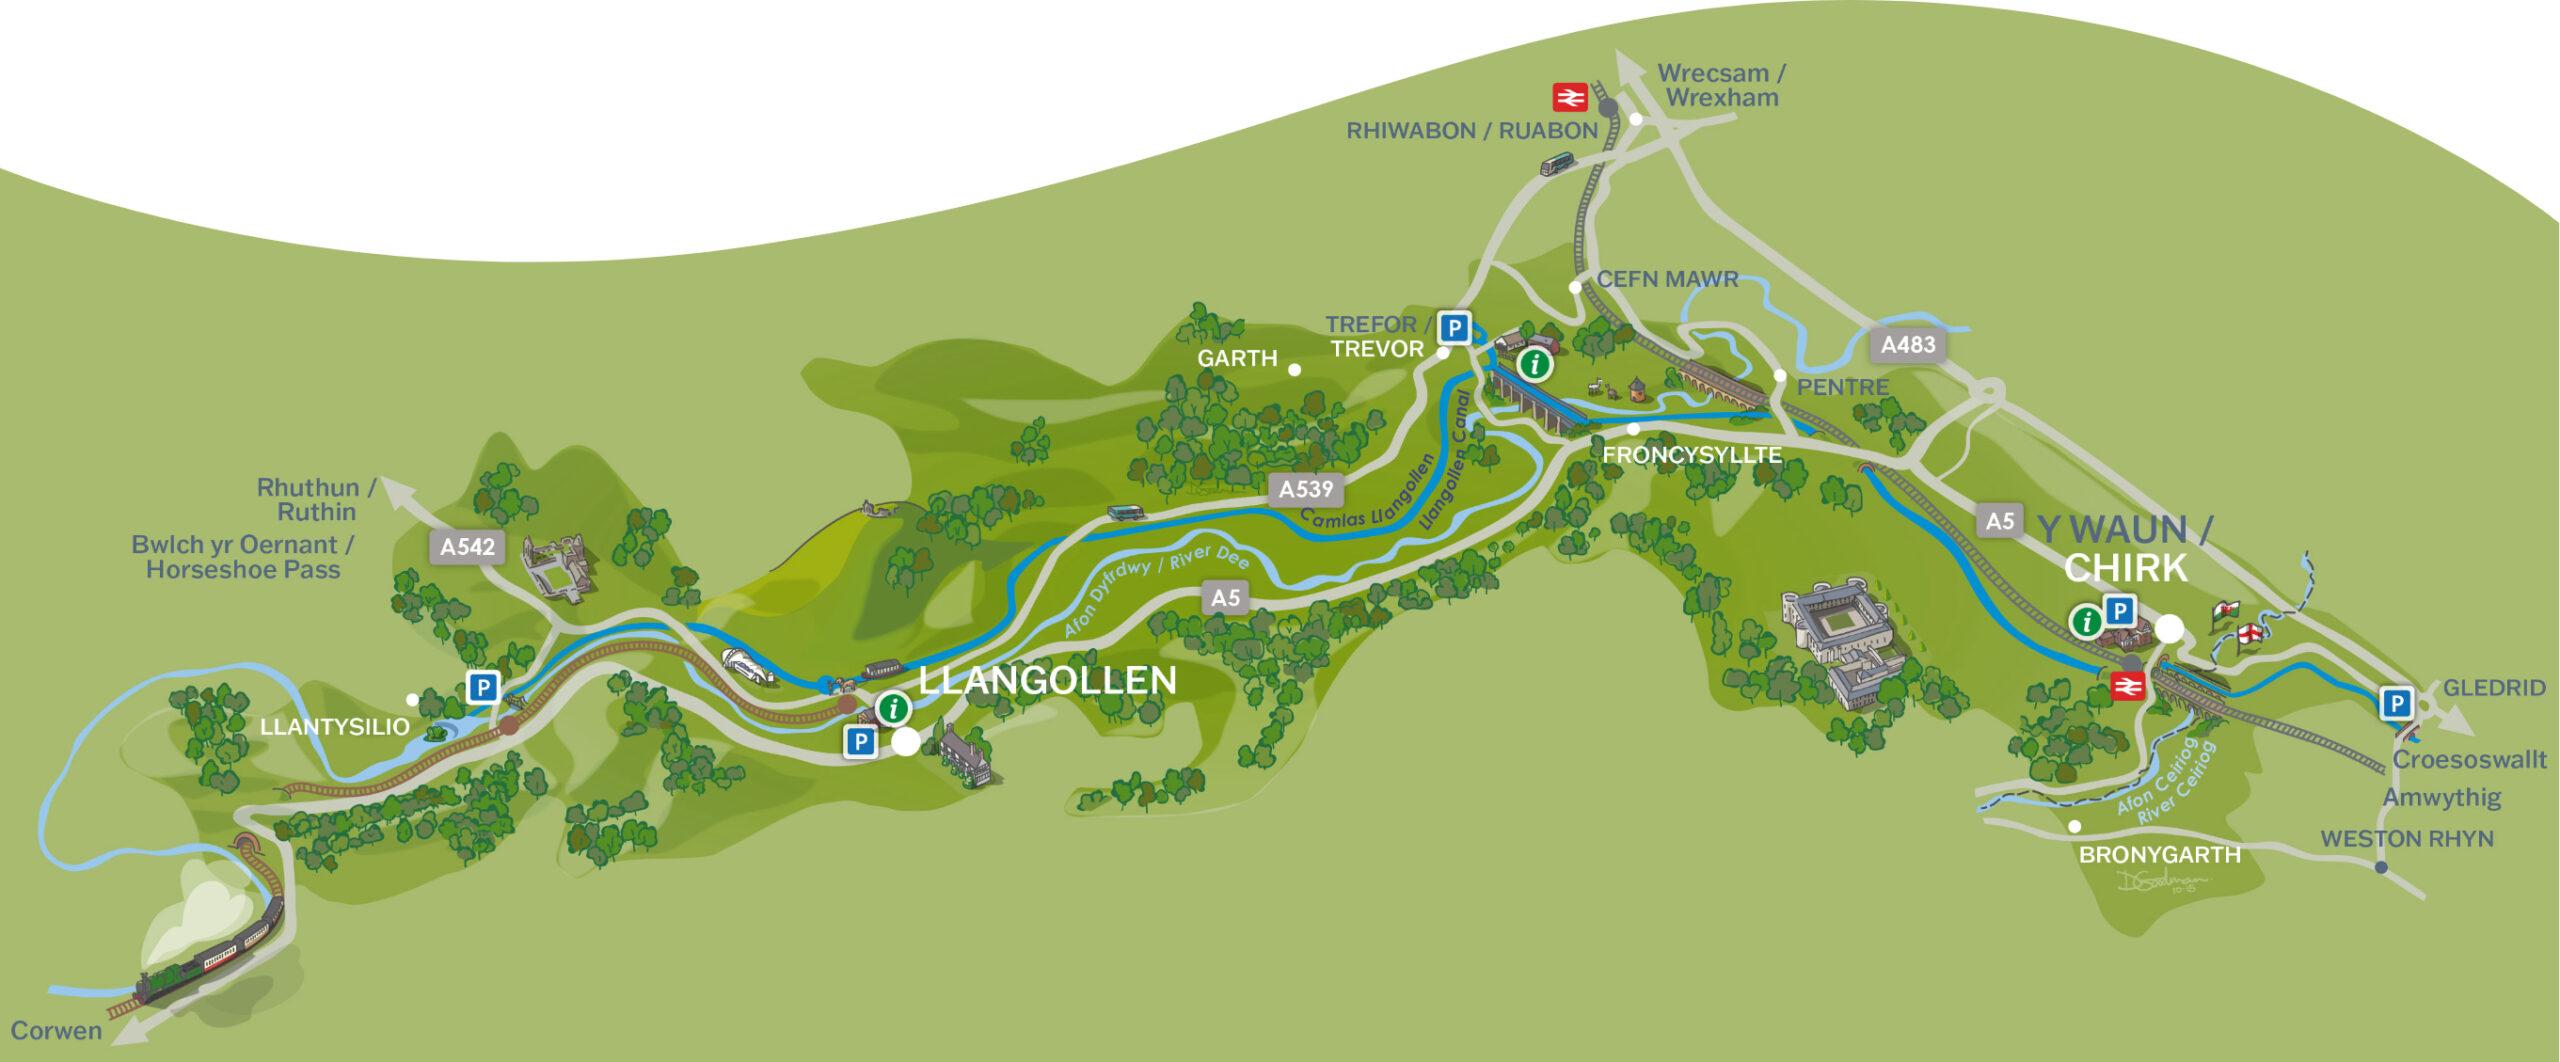 Pontcysyllte World Heritage Site map